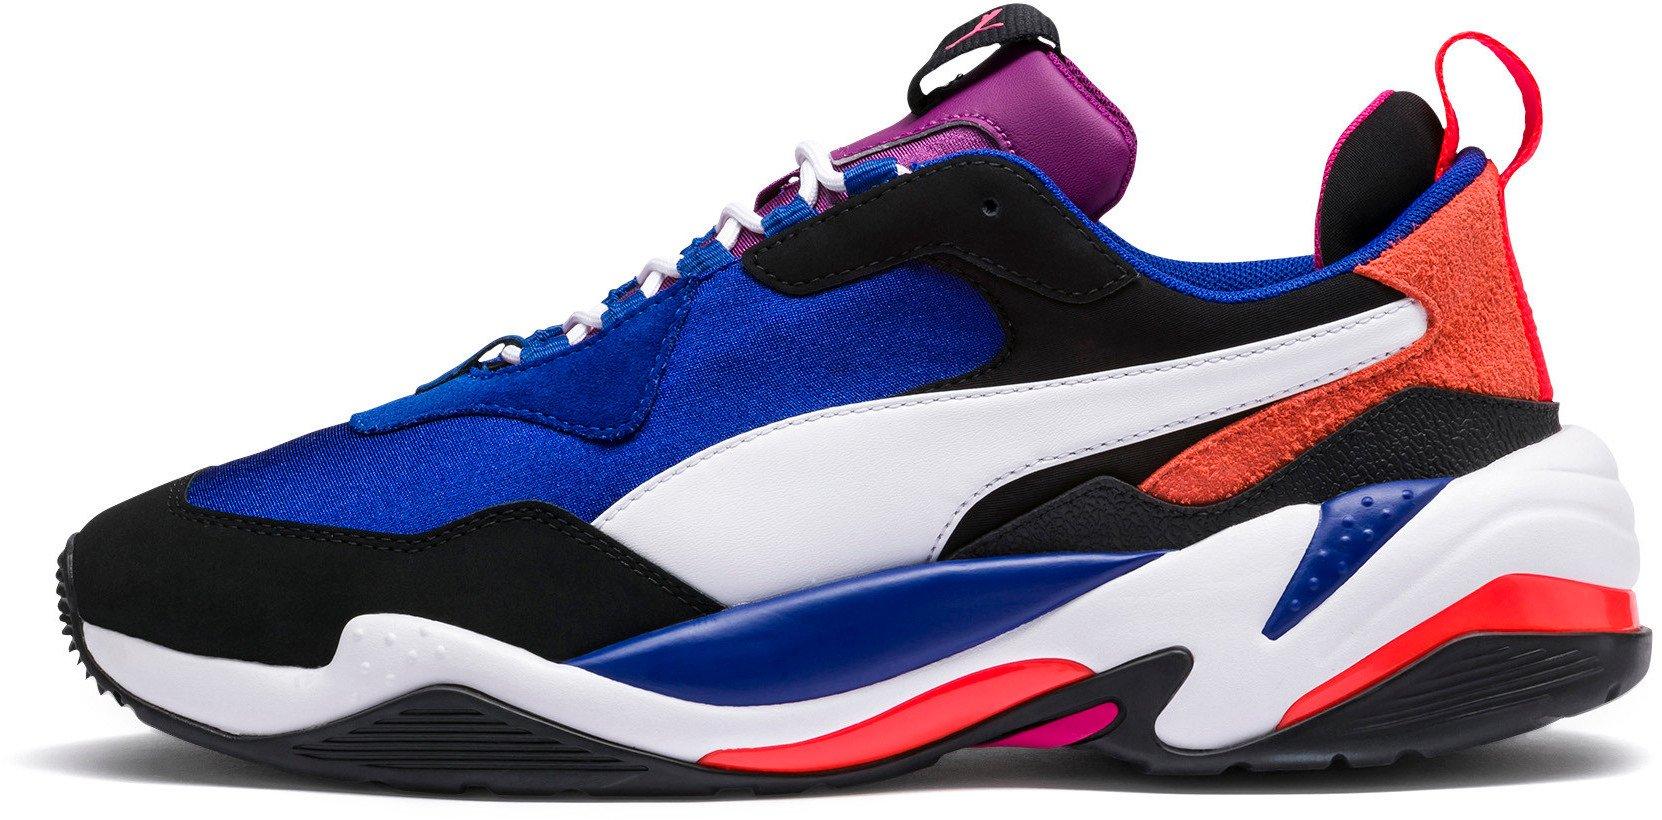 Shoes Puma Thunder 4 LIFE Surf The Web